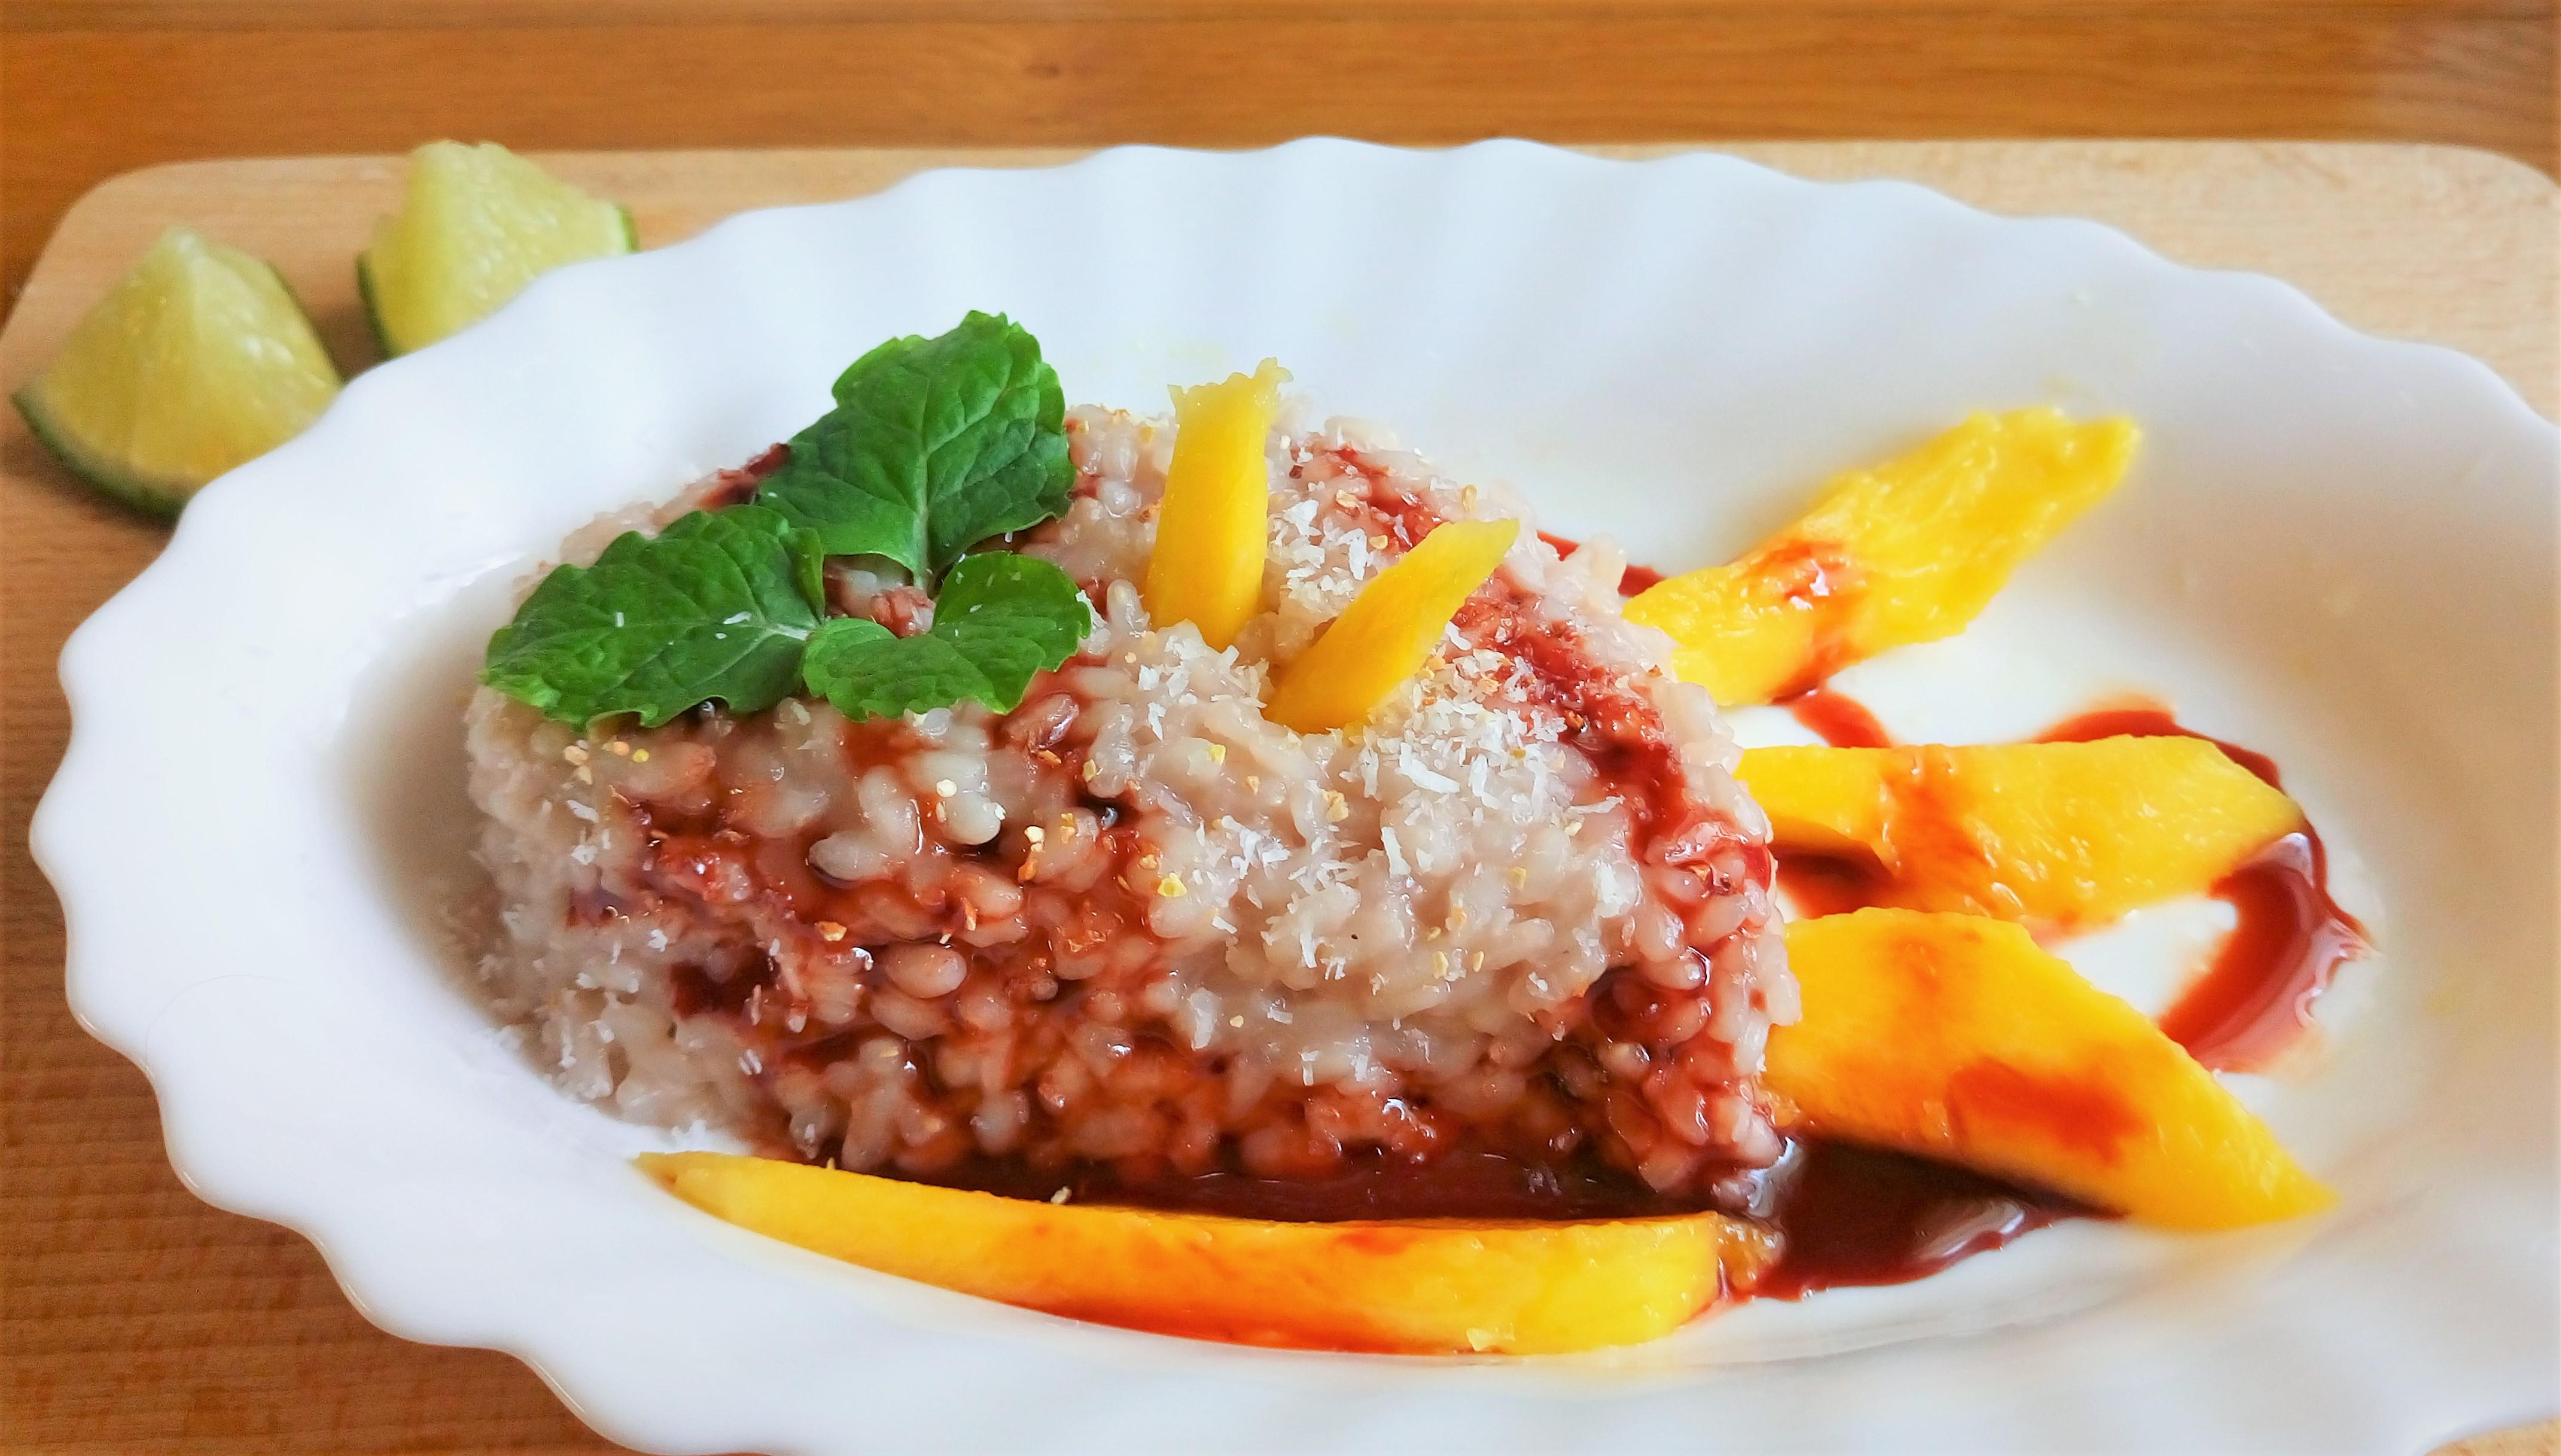 Mango s ryžou na sladko (takmer sticky rice :-) )